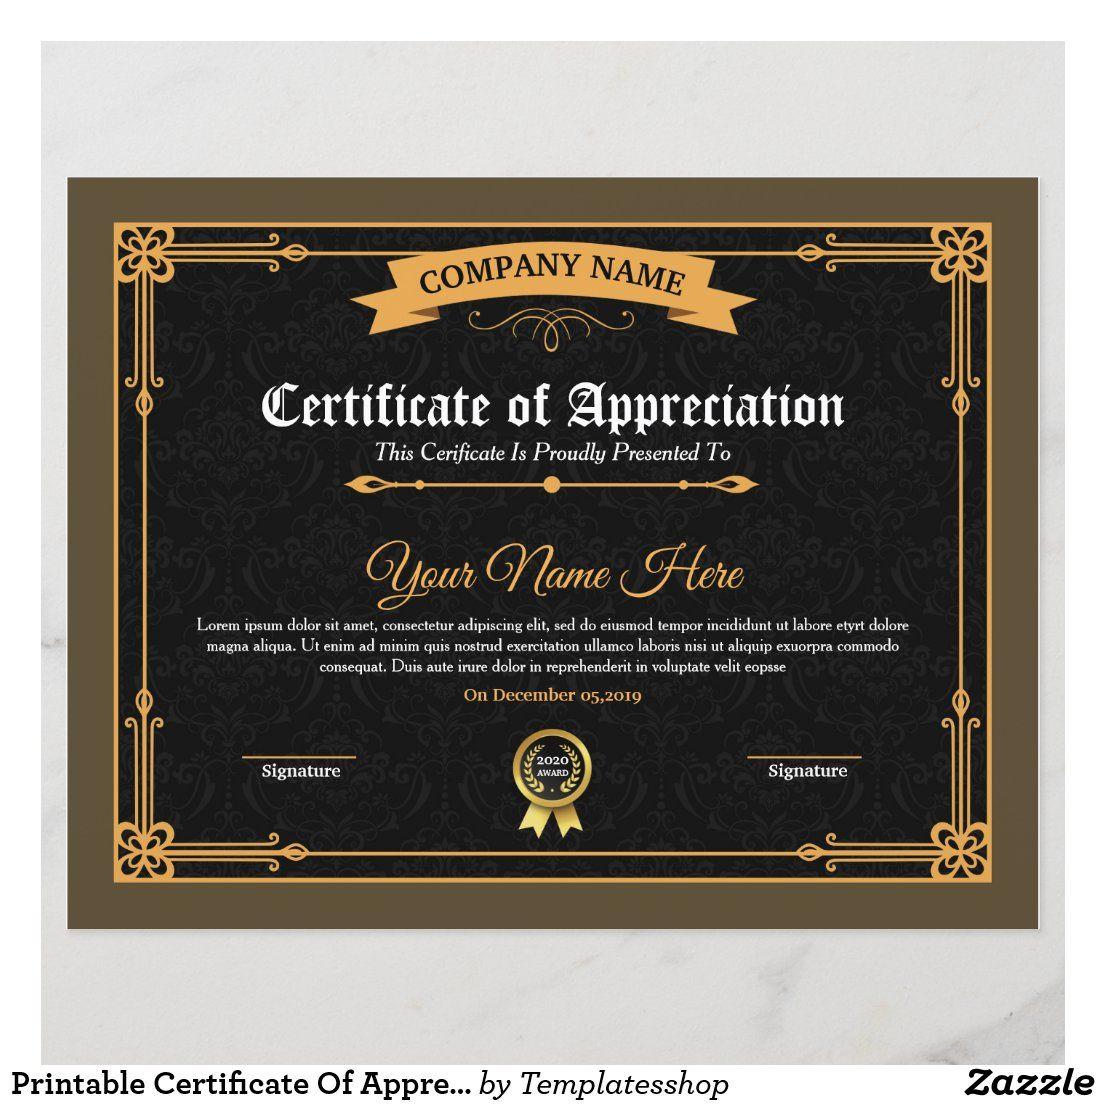 Printable Certificate Of Appreciation Zazzle Com In 2021 Certificate Of Appreciation Printable Certificates Appreciation Printable Father of the year certificates